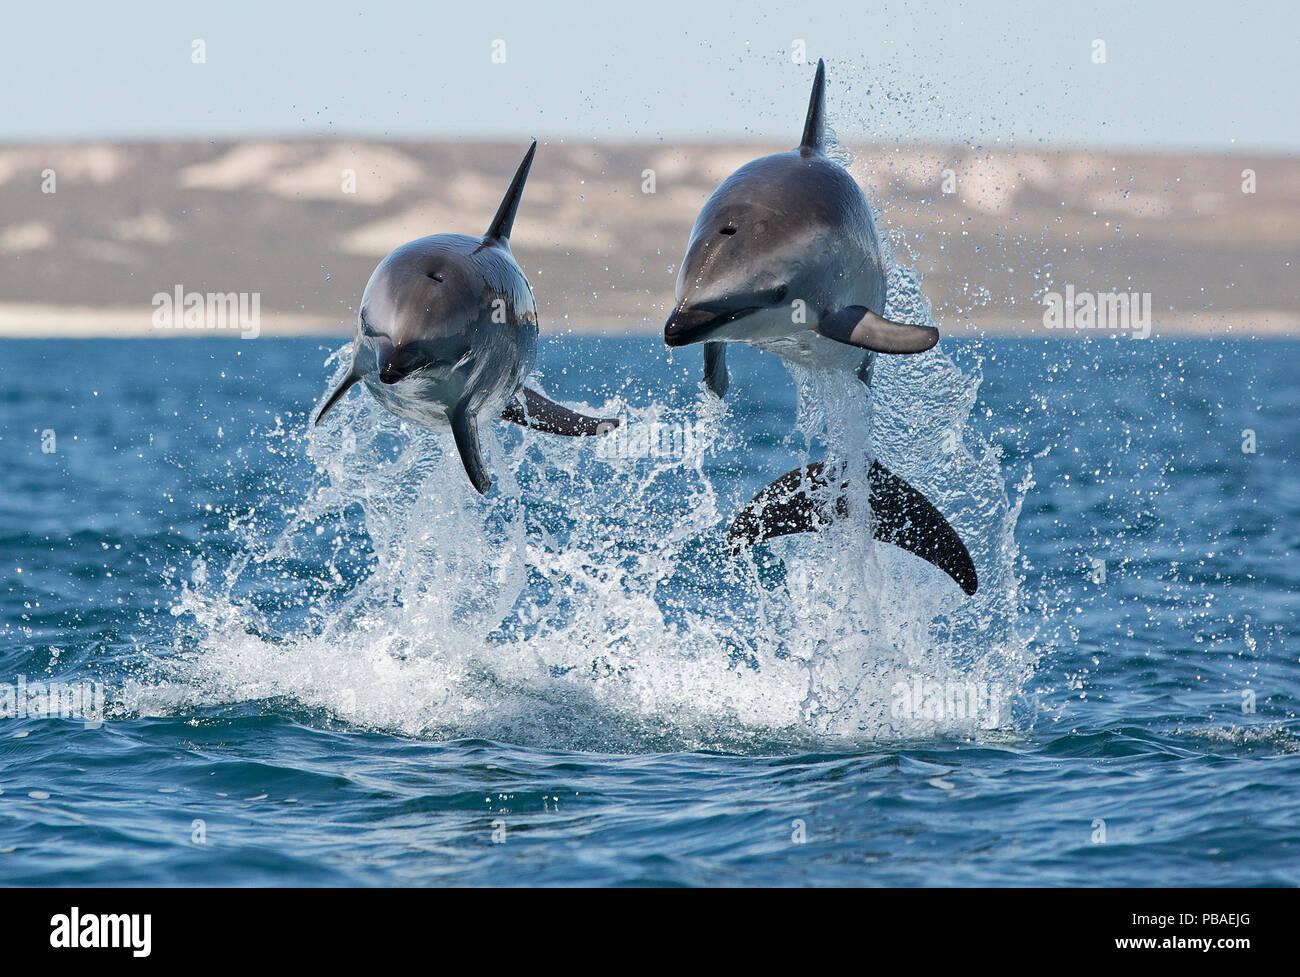 Dusky dolphins (Lagenorhynchus obscurus) porpoising, Puerto Madryn, Peninsula Valdez, Argentina, December. - Stock Image